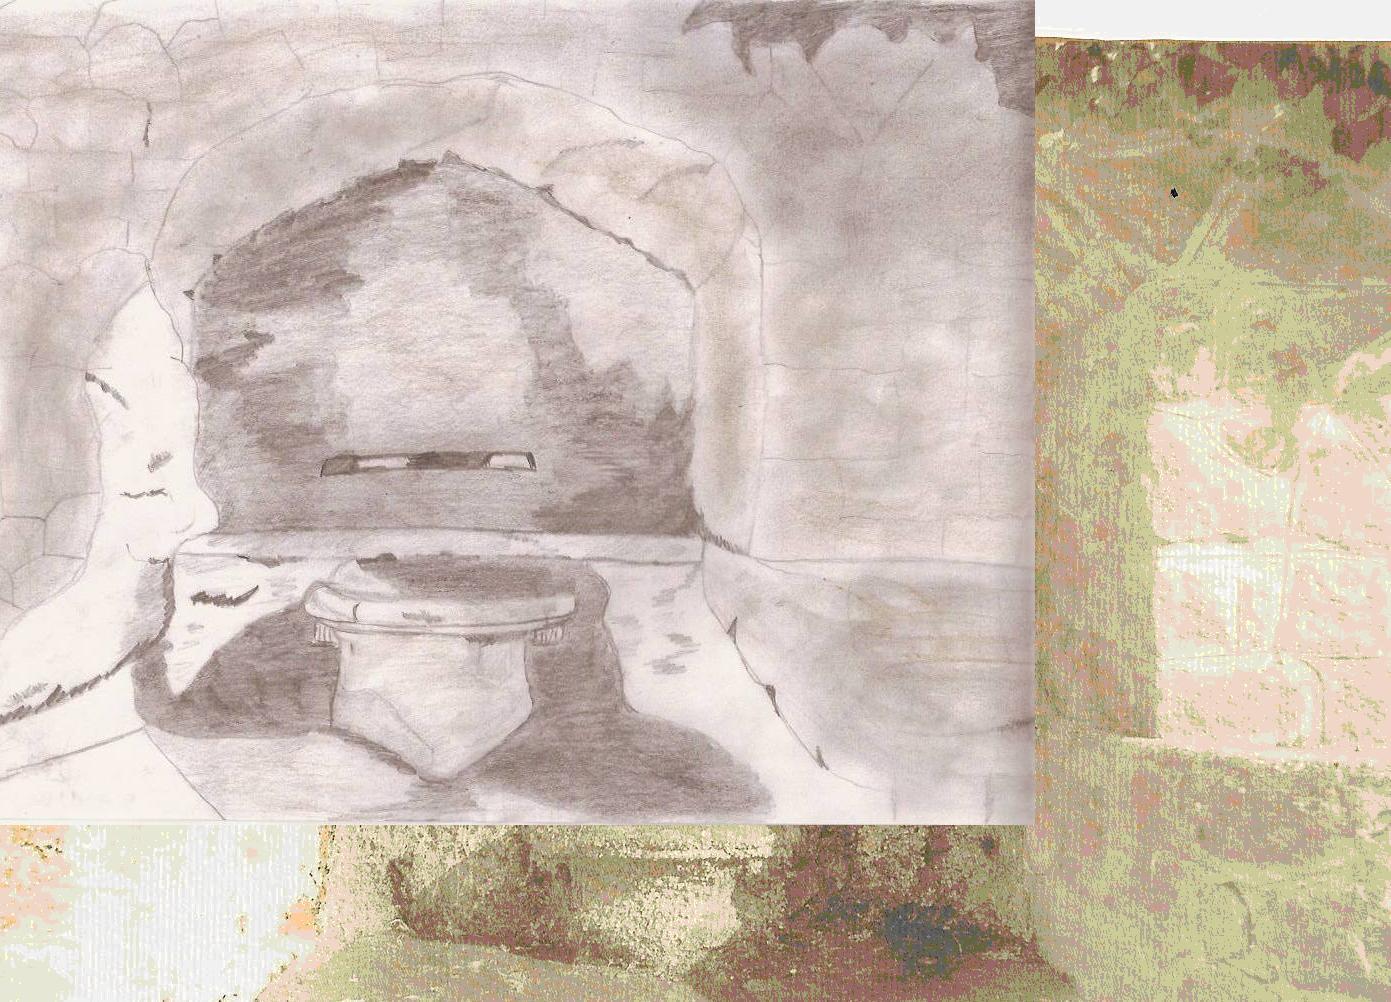 fontana_napoli_disegno